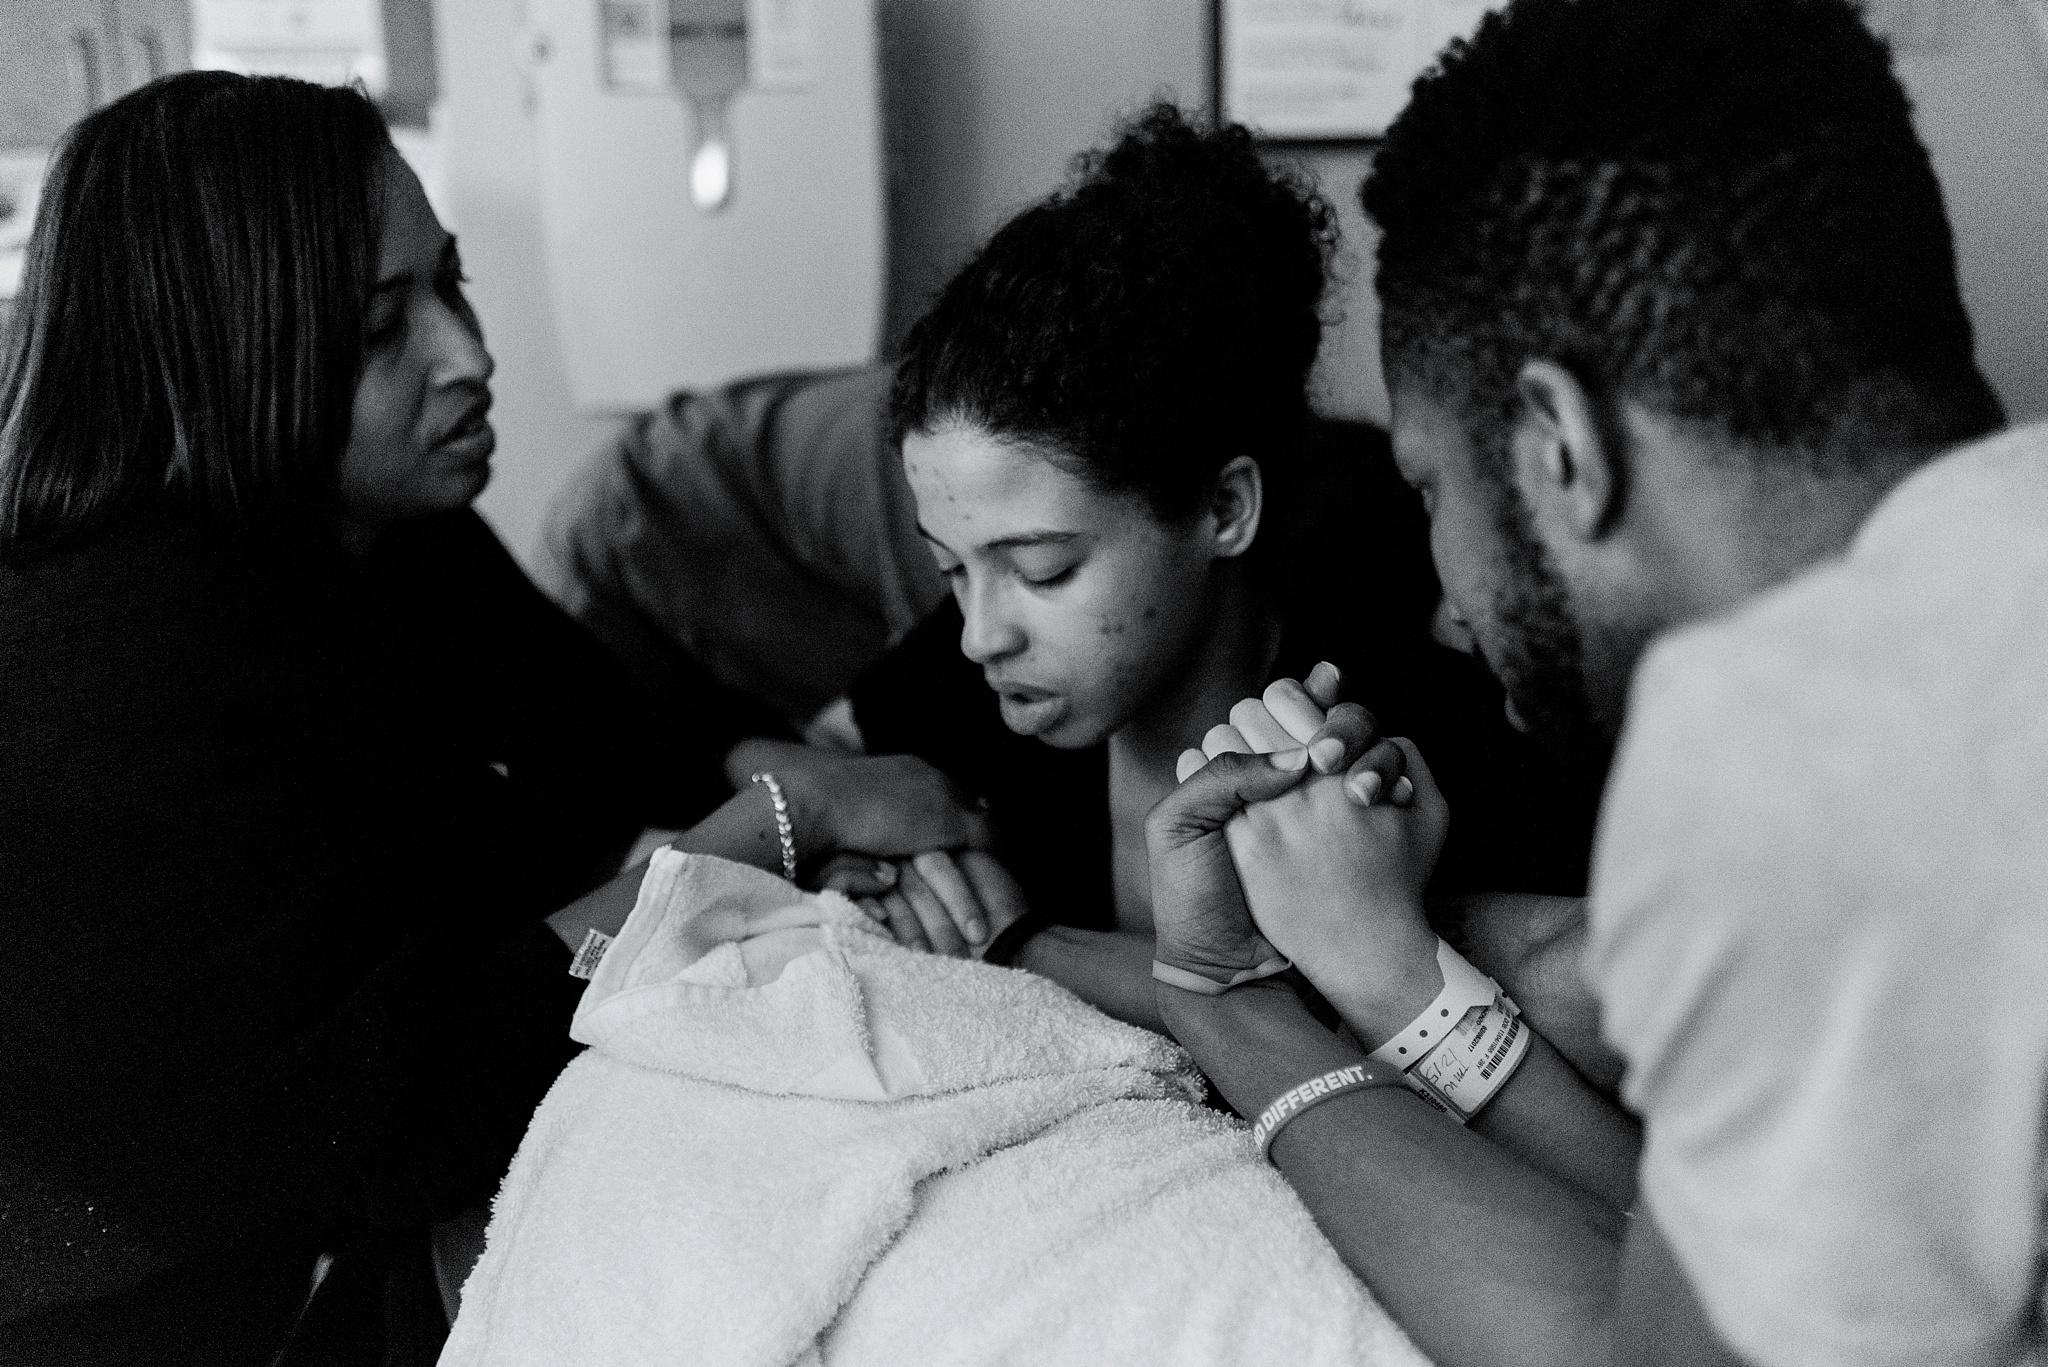 atlanta-medical-center-birth-photographer-nykole-smith-253.jpg